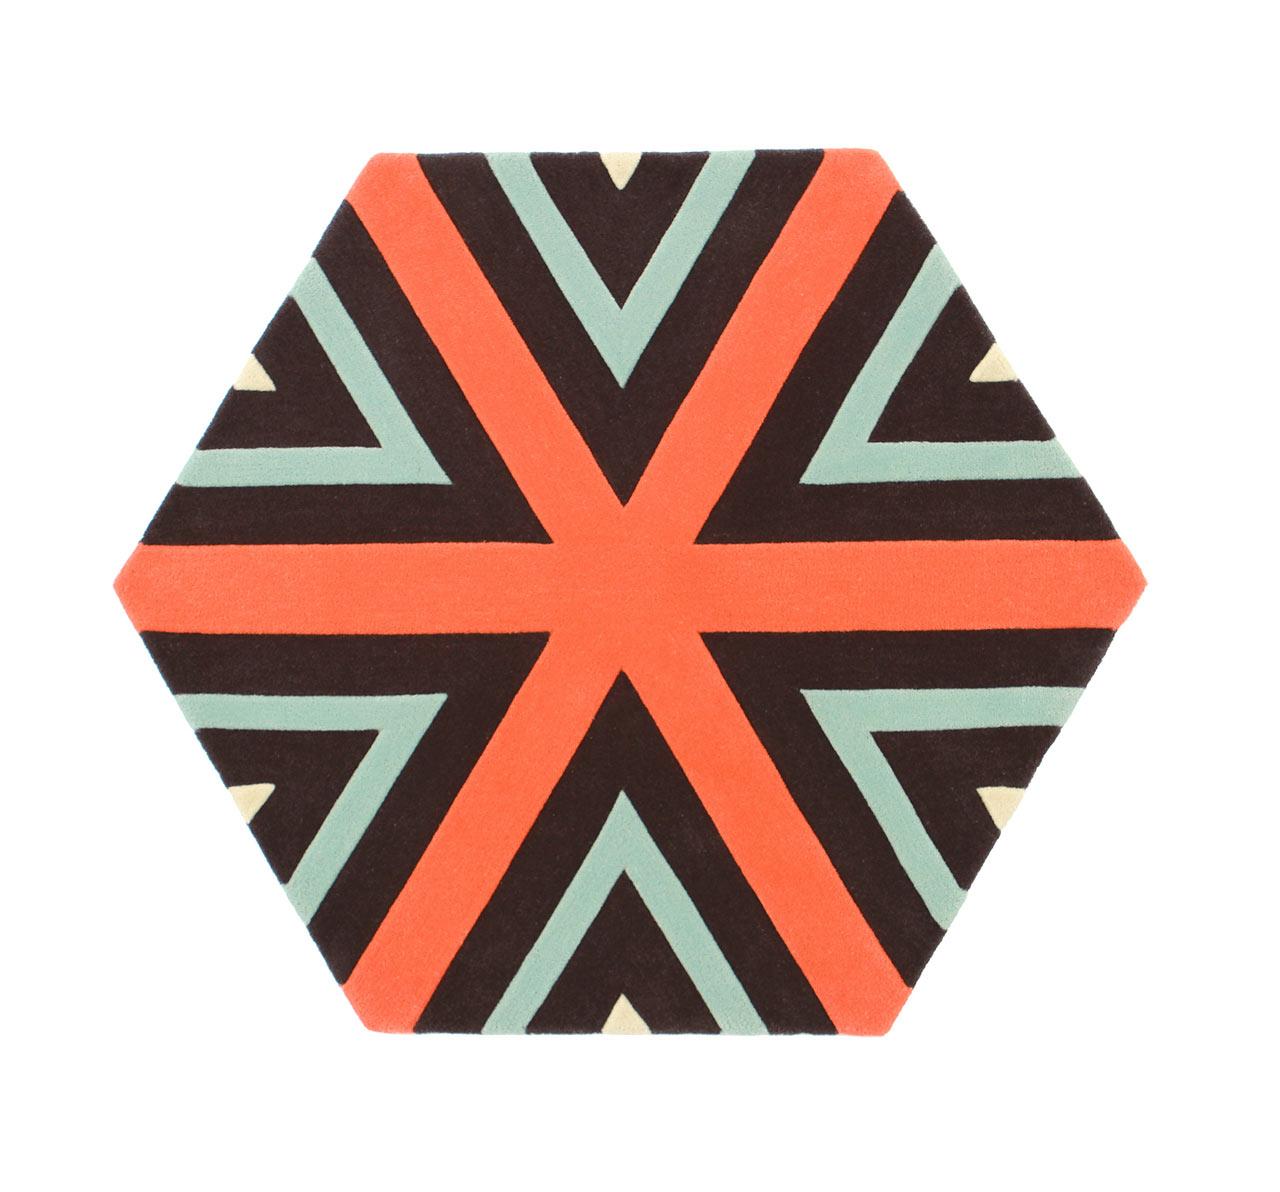 Kinder-GROUND-Modular-Carpet-2-cubist